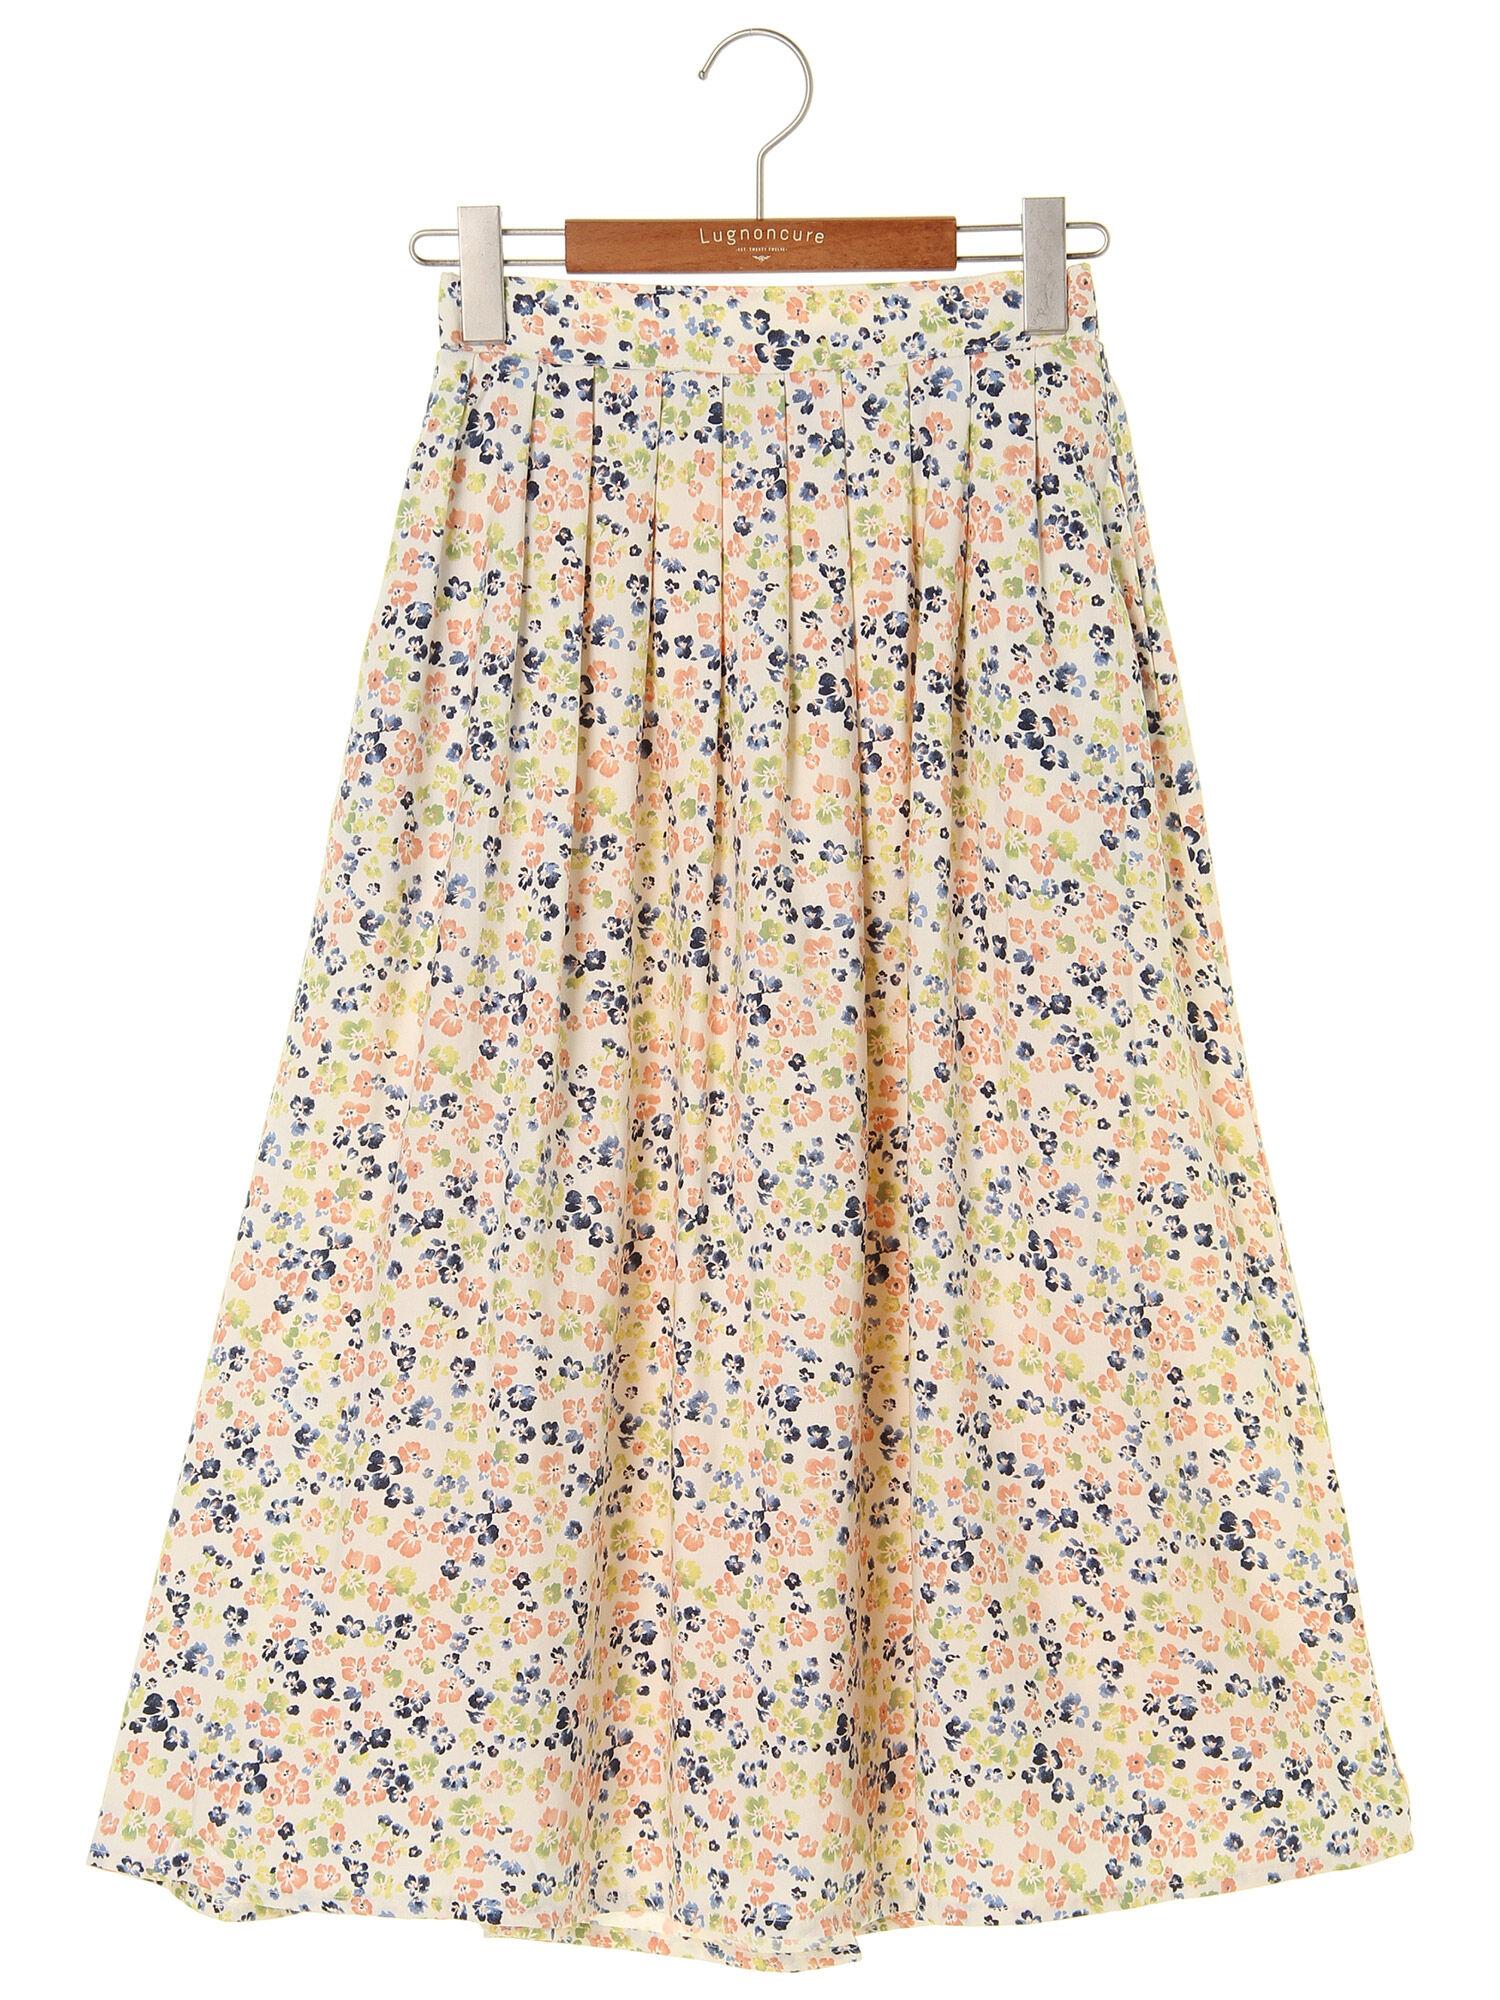 C/R小花総柄ギャザースカート